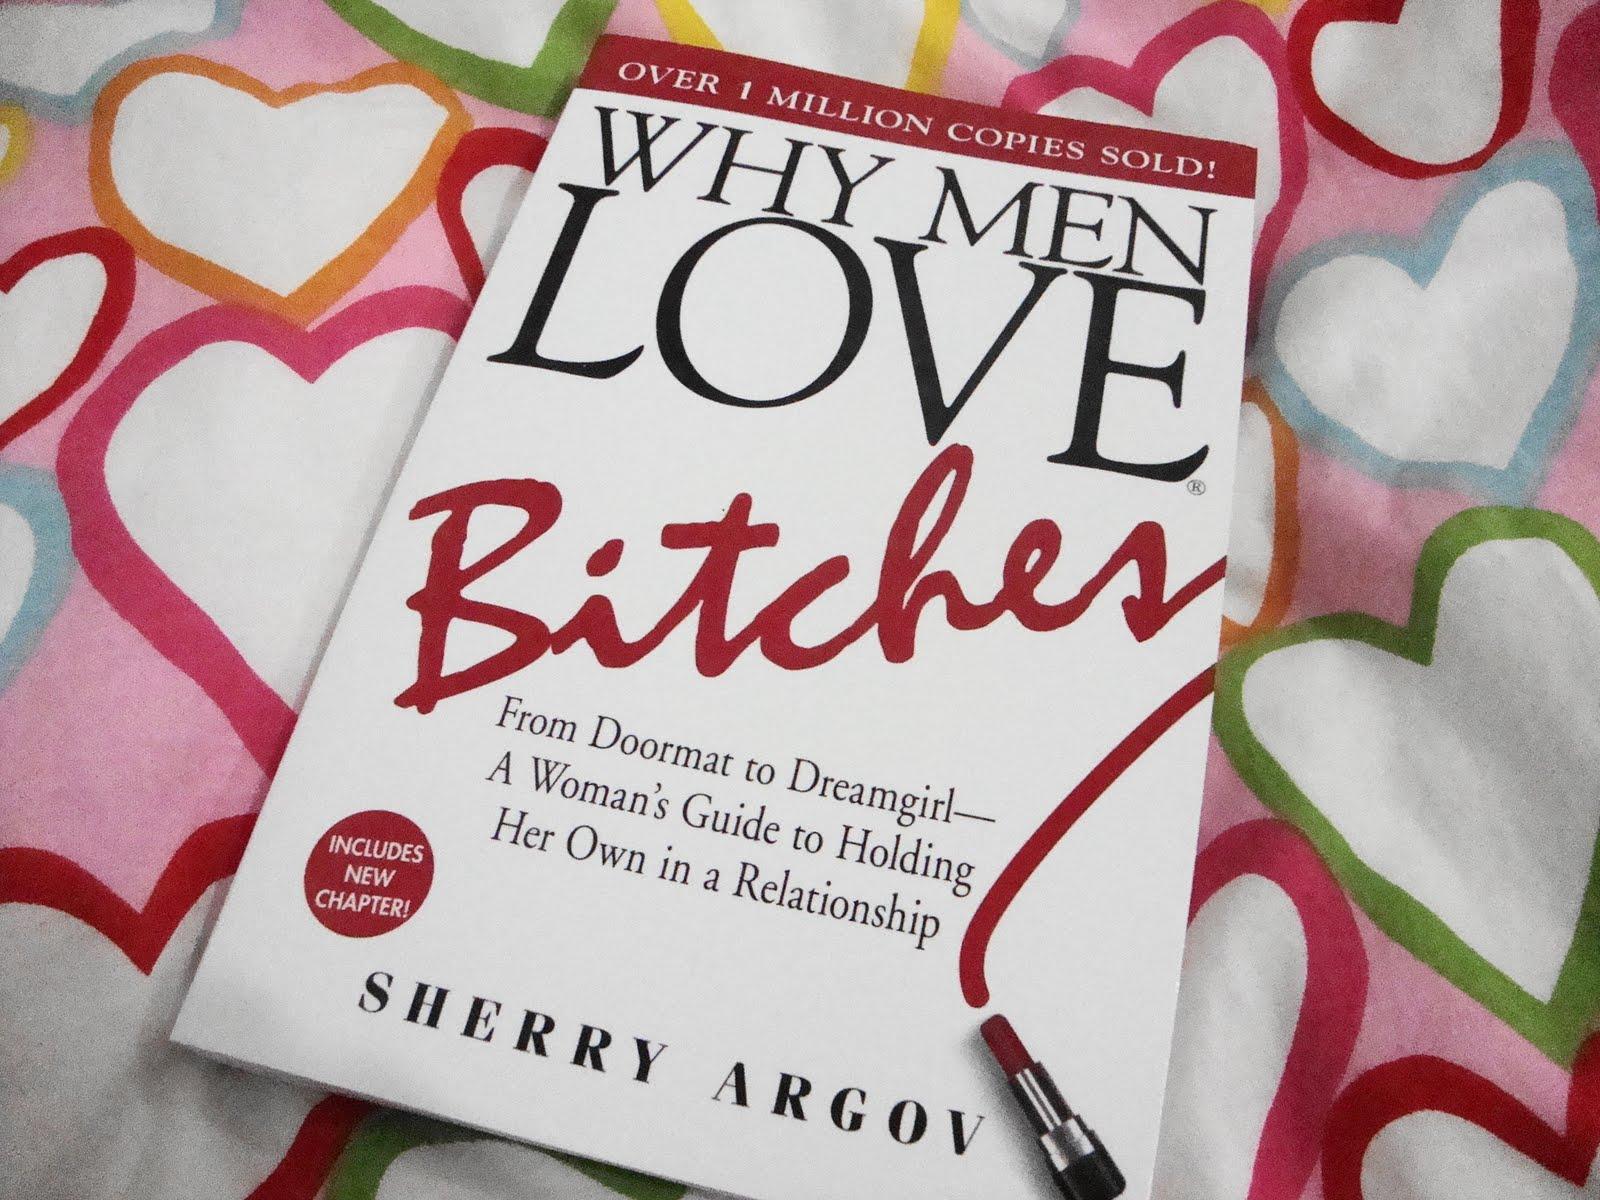 Why men love book